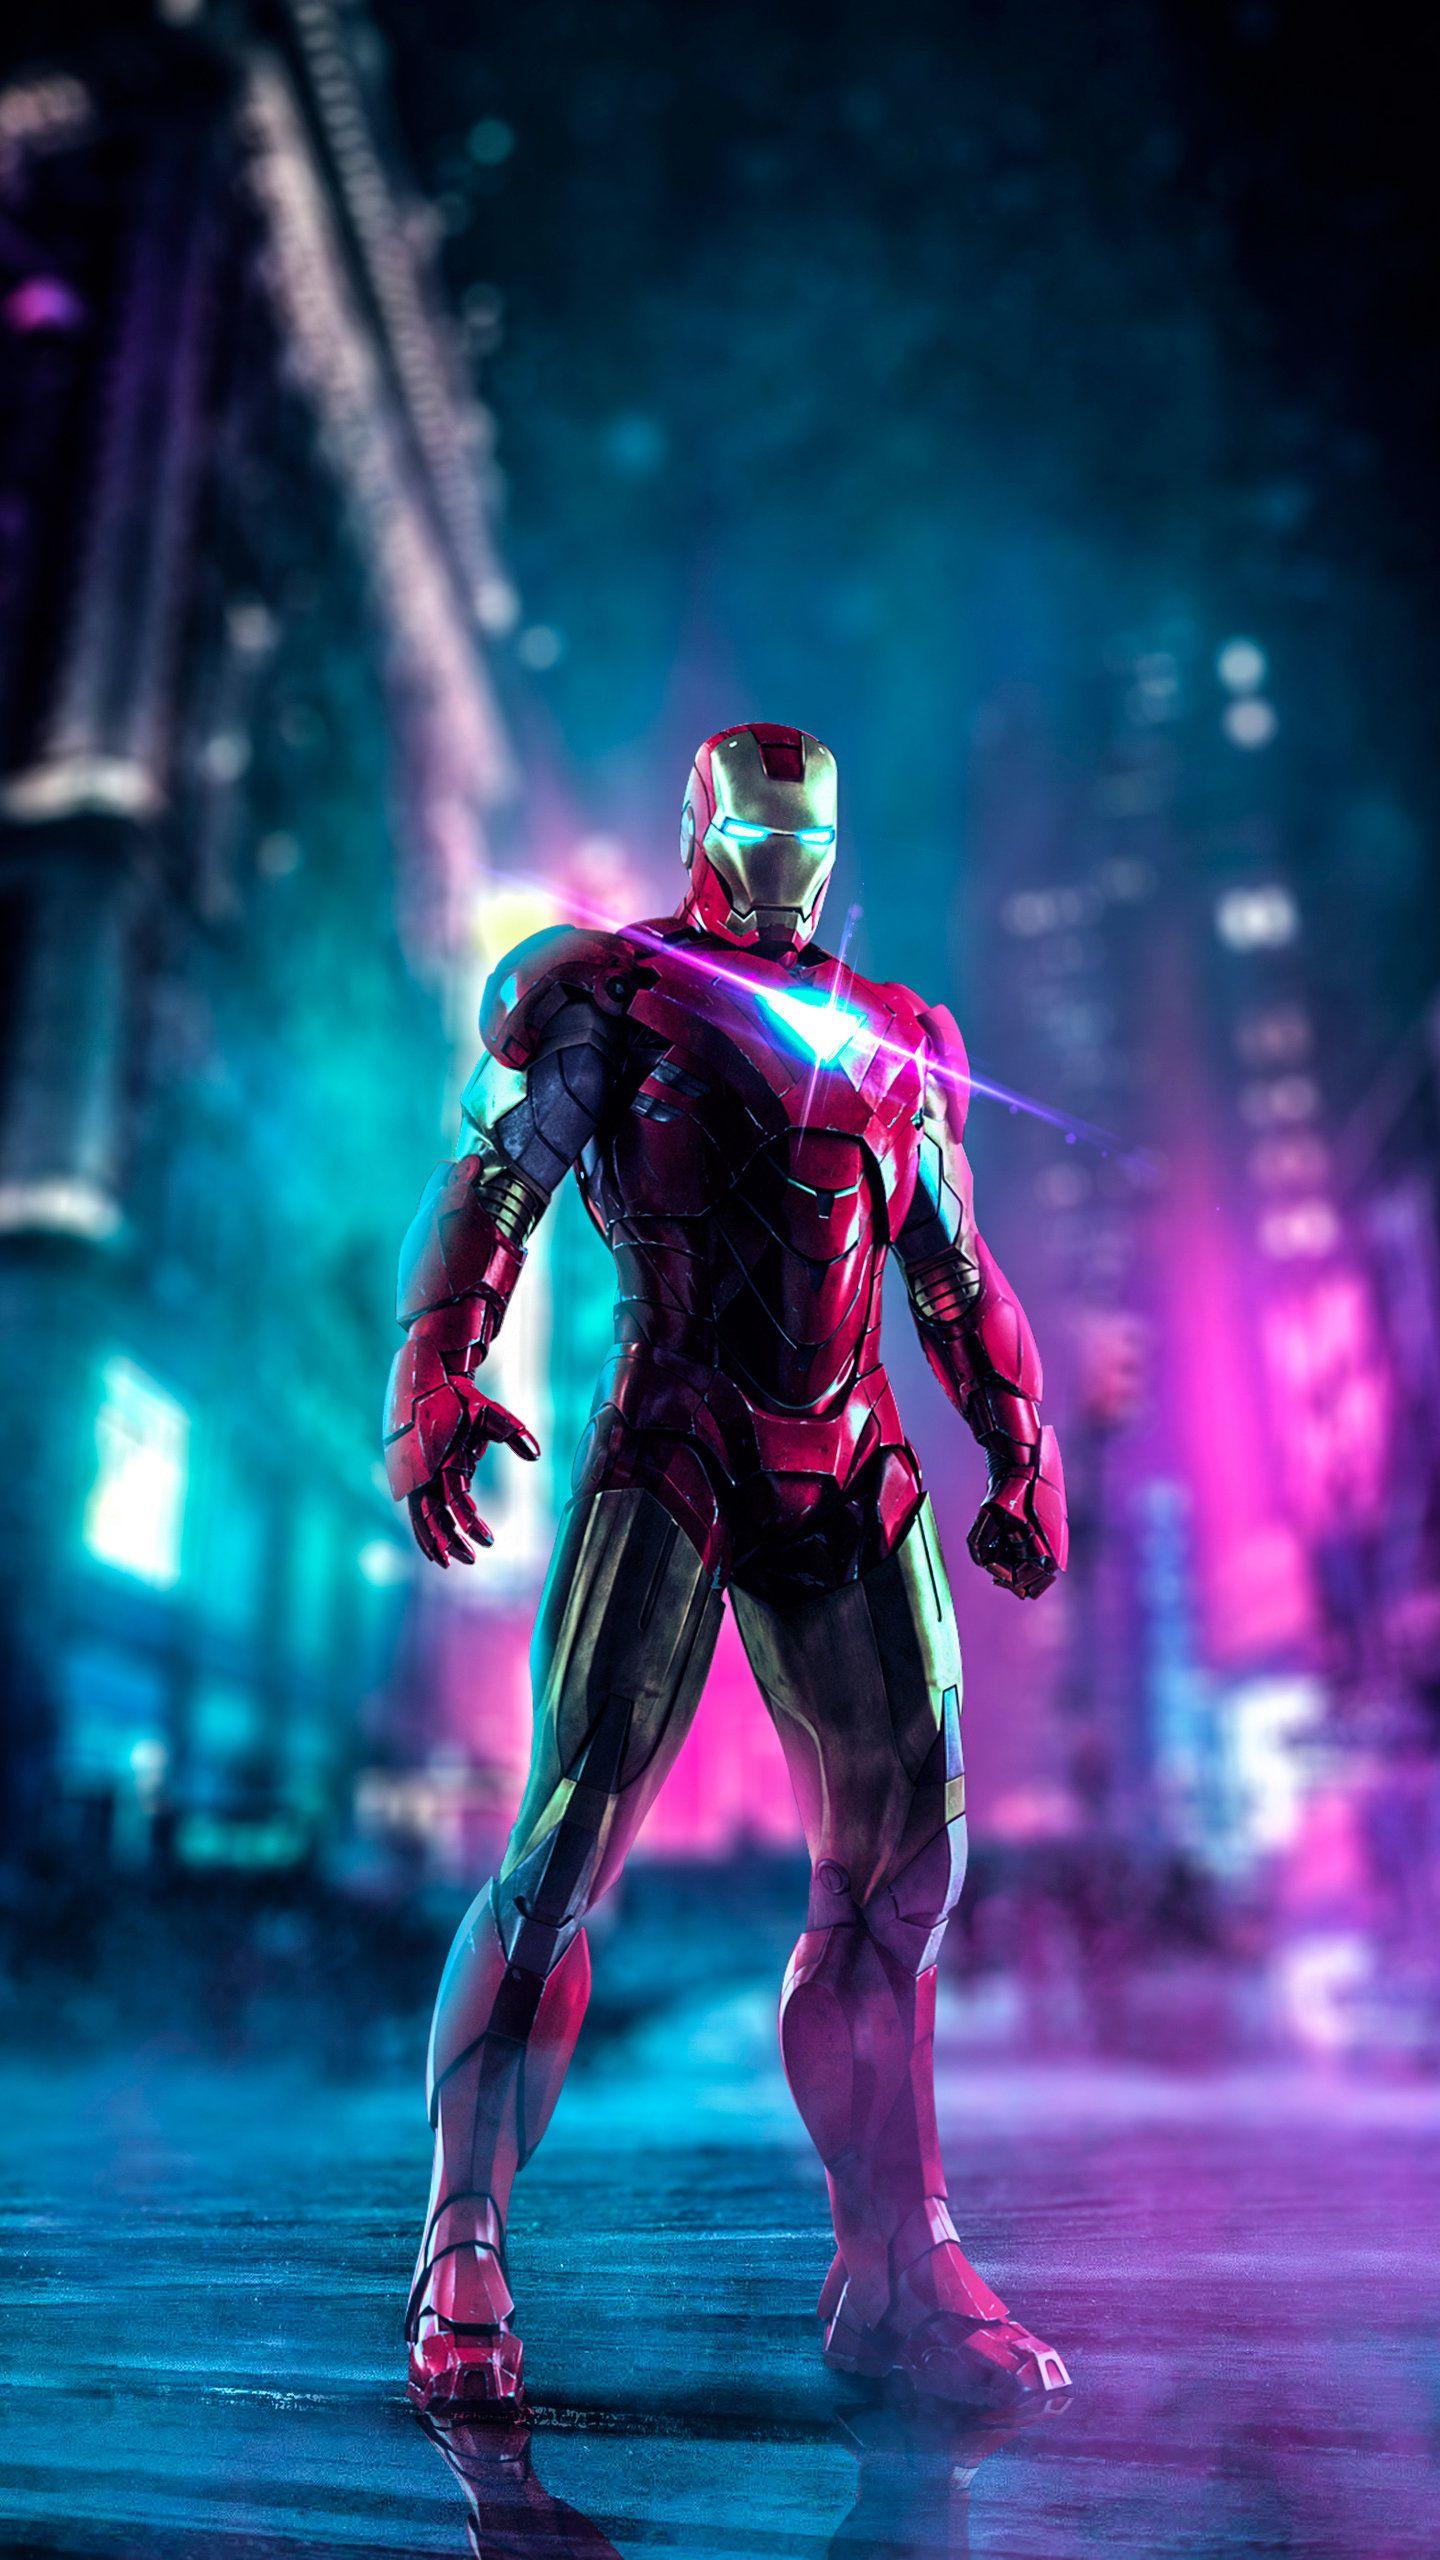 Iron Man Neon Art Hd Wallpaper In 2020 Iron Man Wallpaper Iron